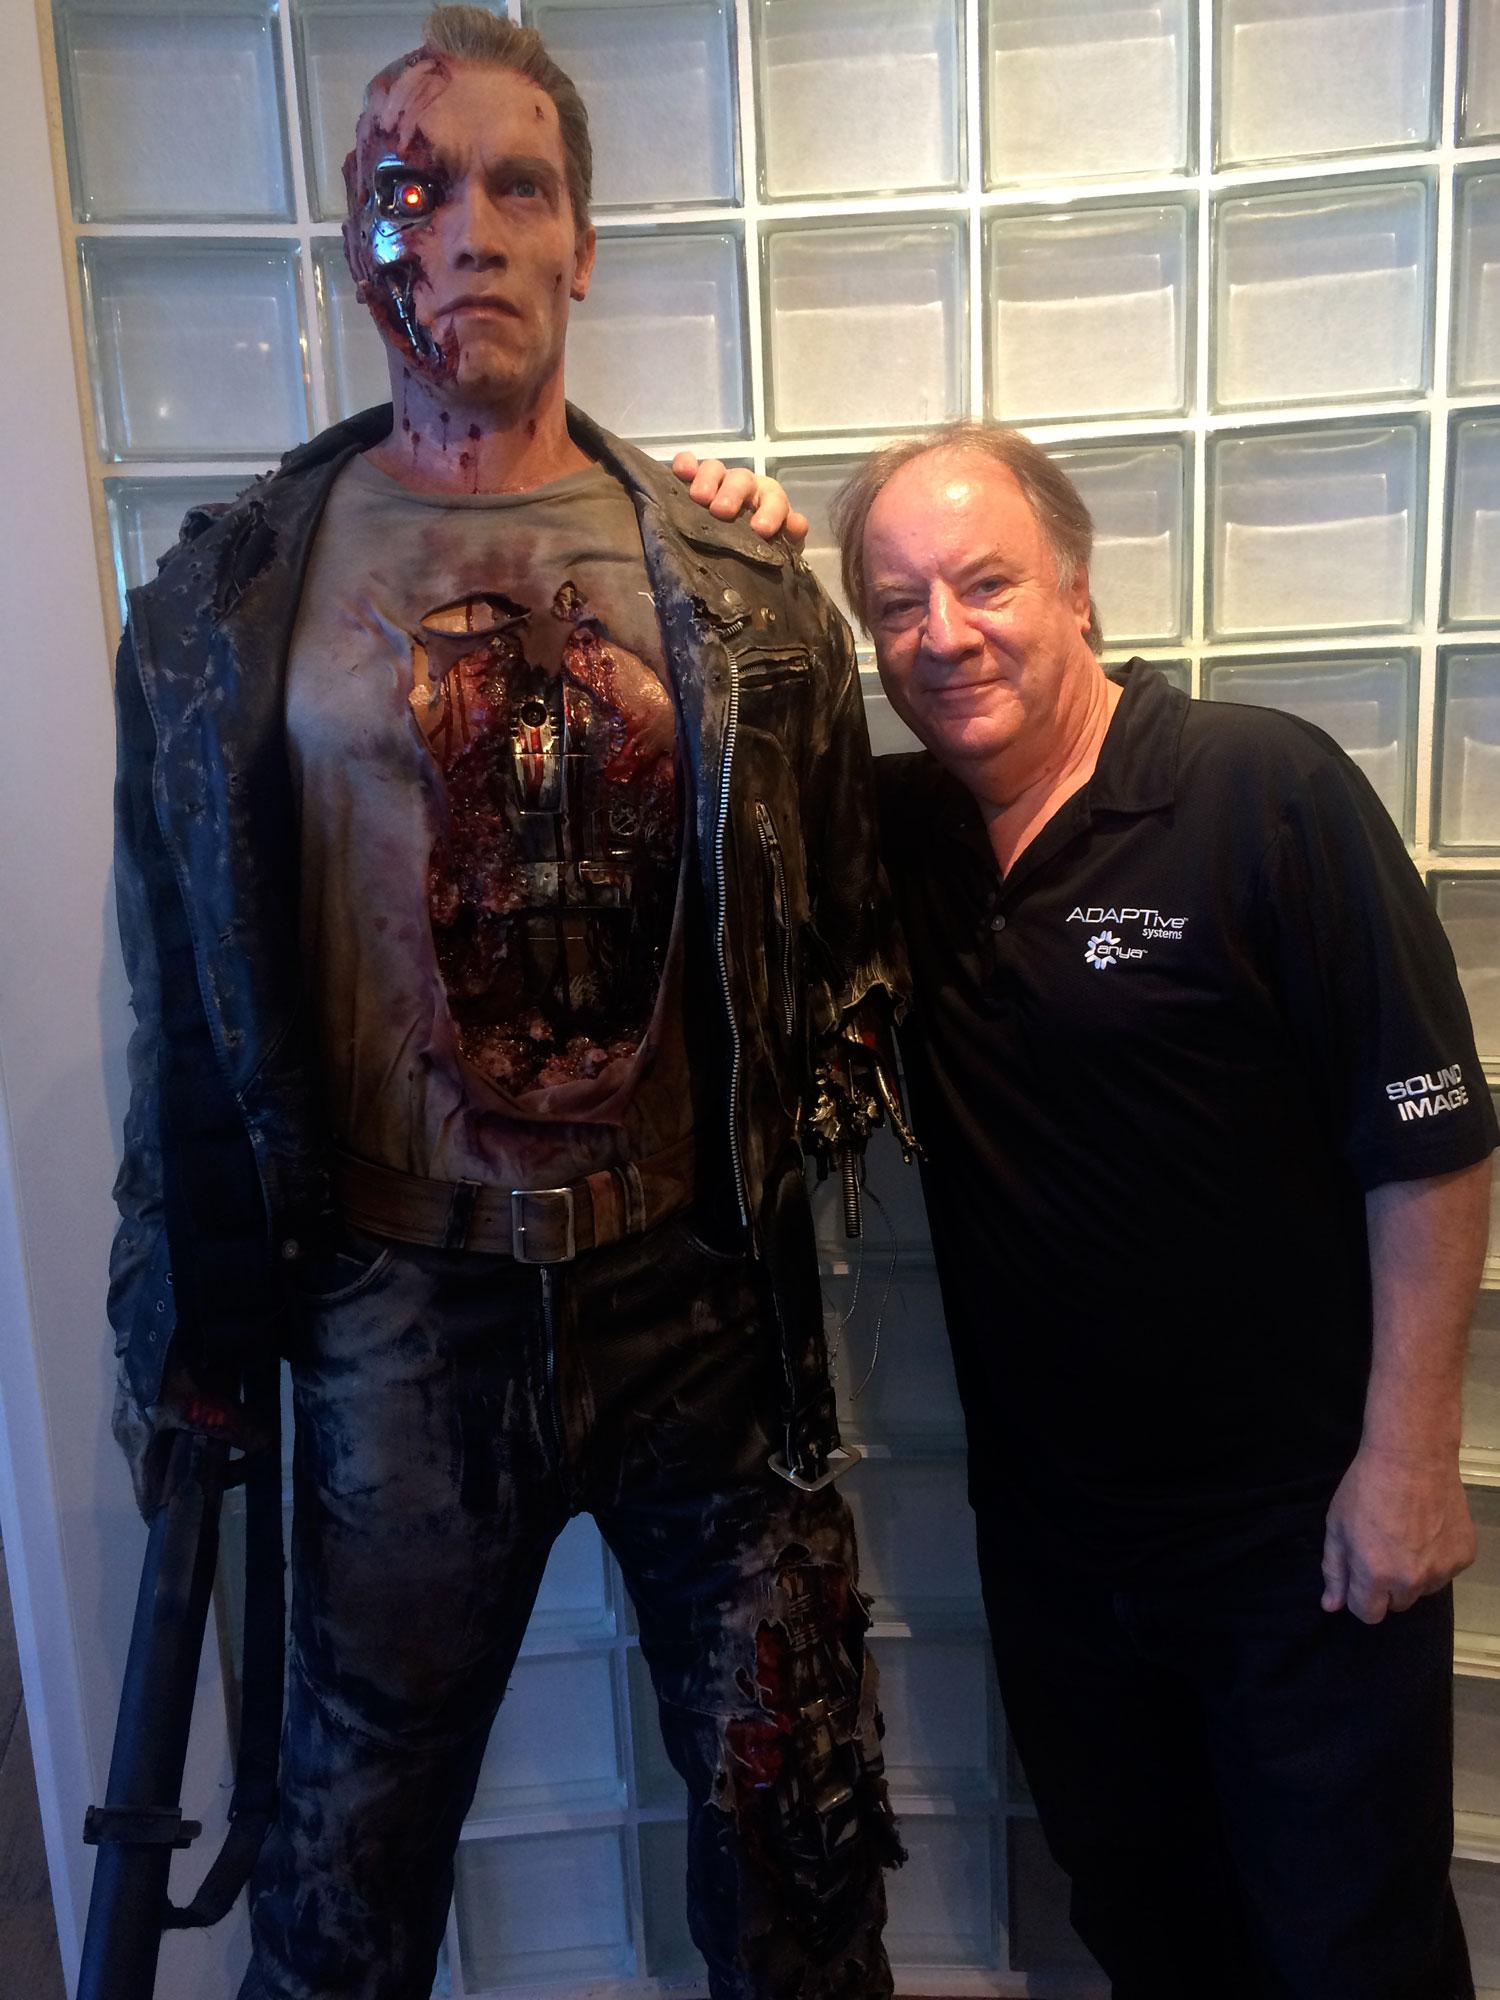 Arnold Schwarzenegger with Mick Walker, Vivi-Q